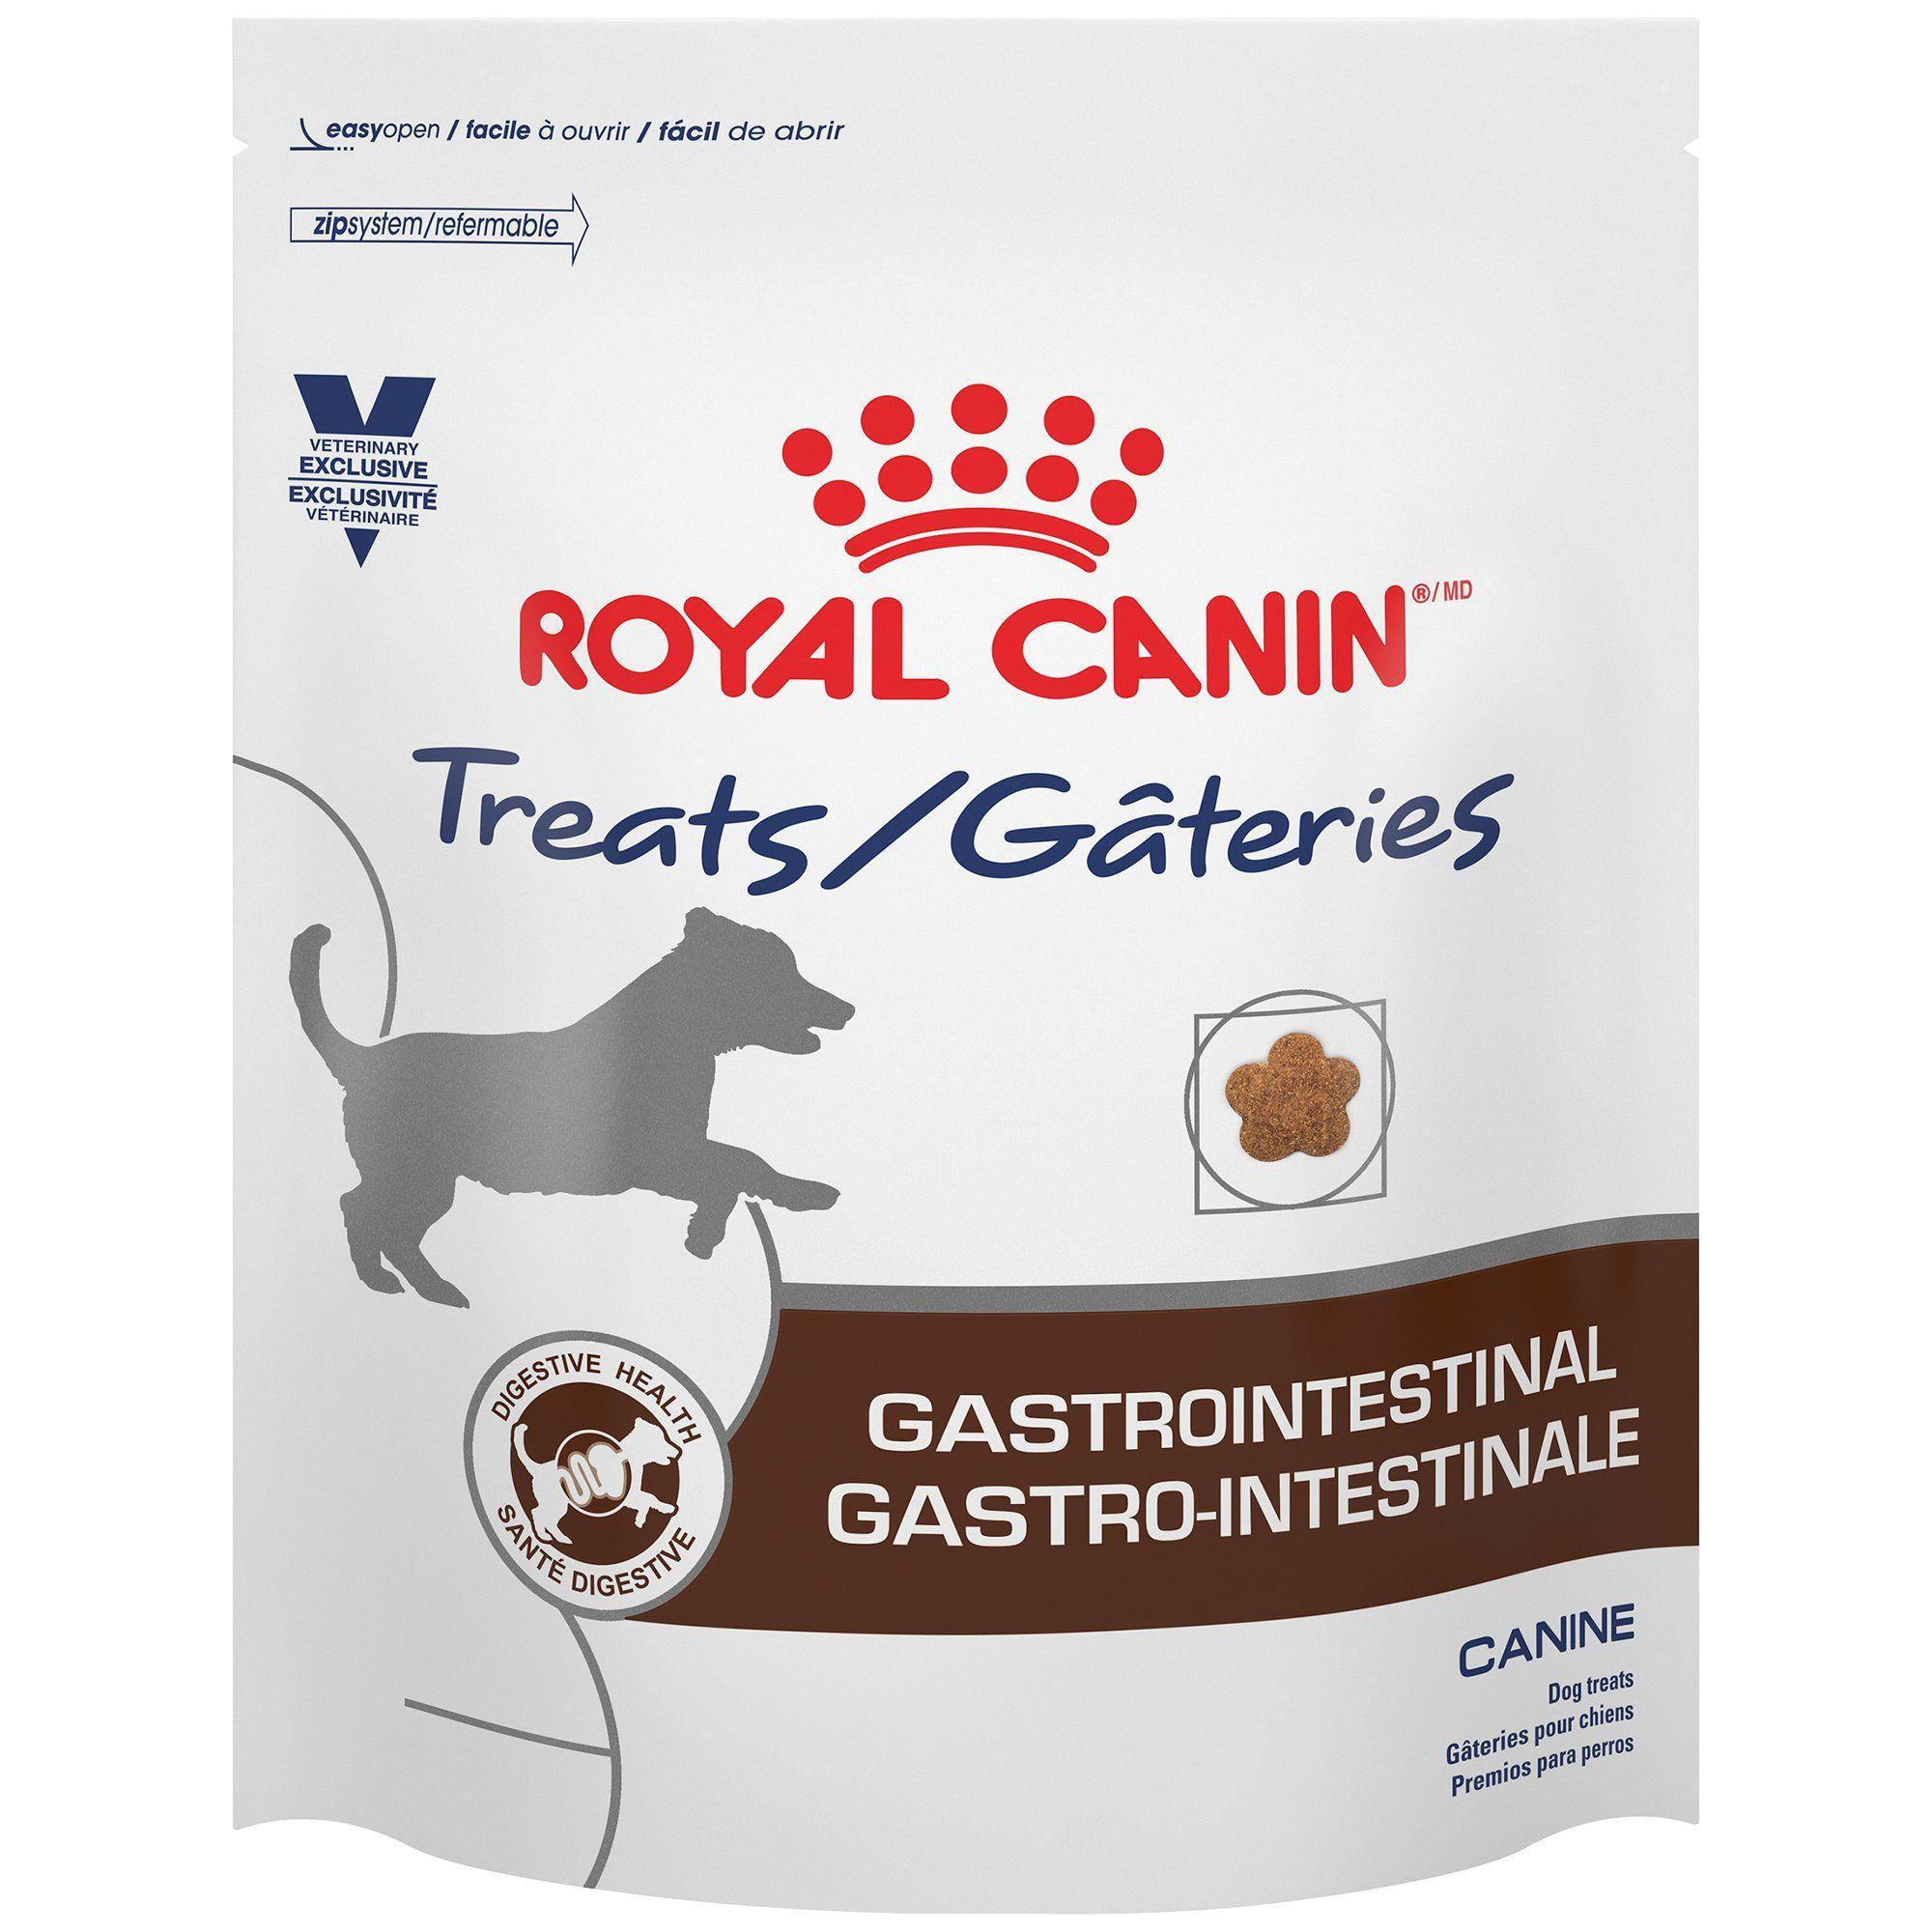 Royal Canin Veterinary Diet Gastrointestinal Canine Dog Treats 1 1 Lbs Petco Royal Canin Veterinary Canine